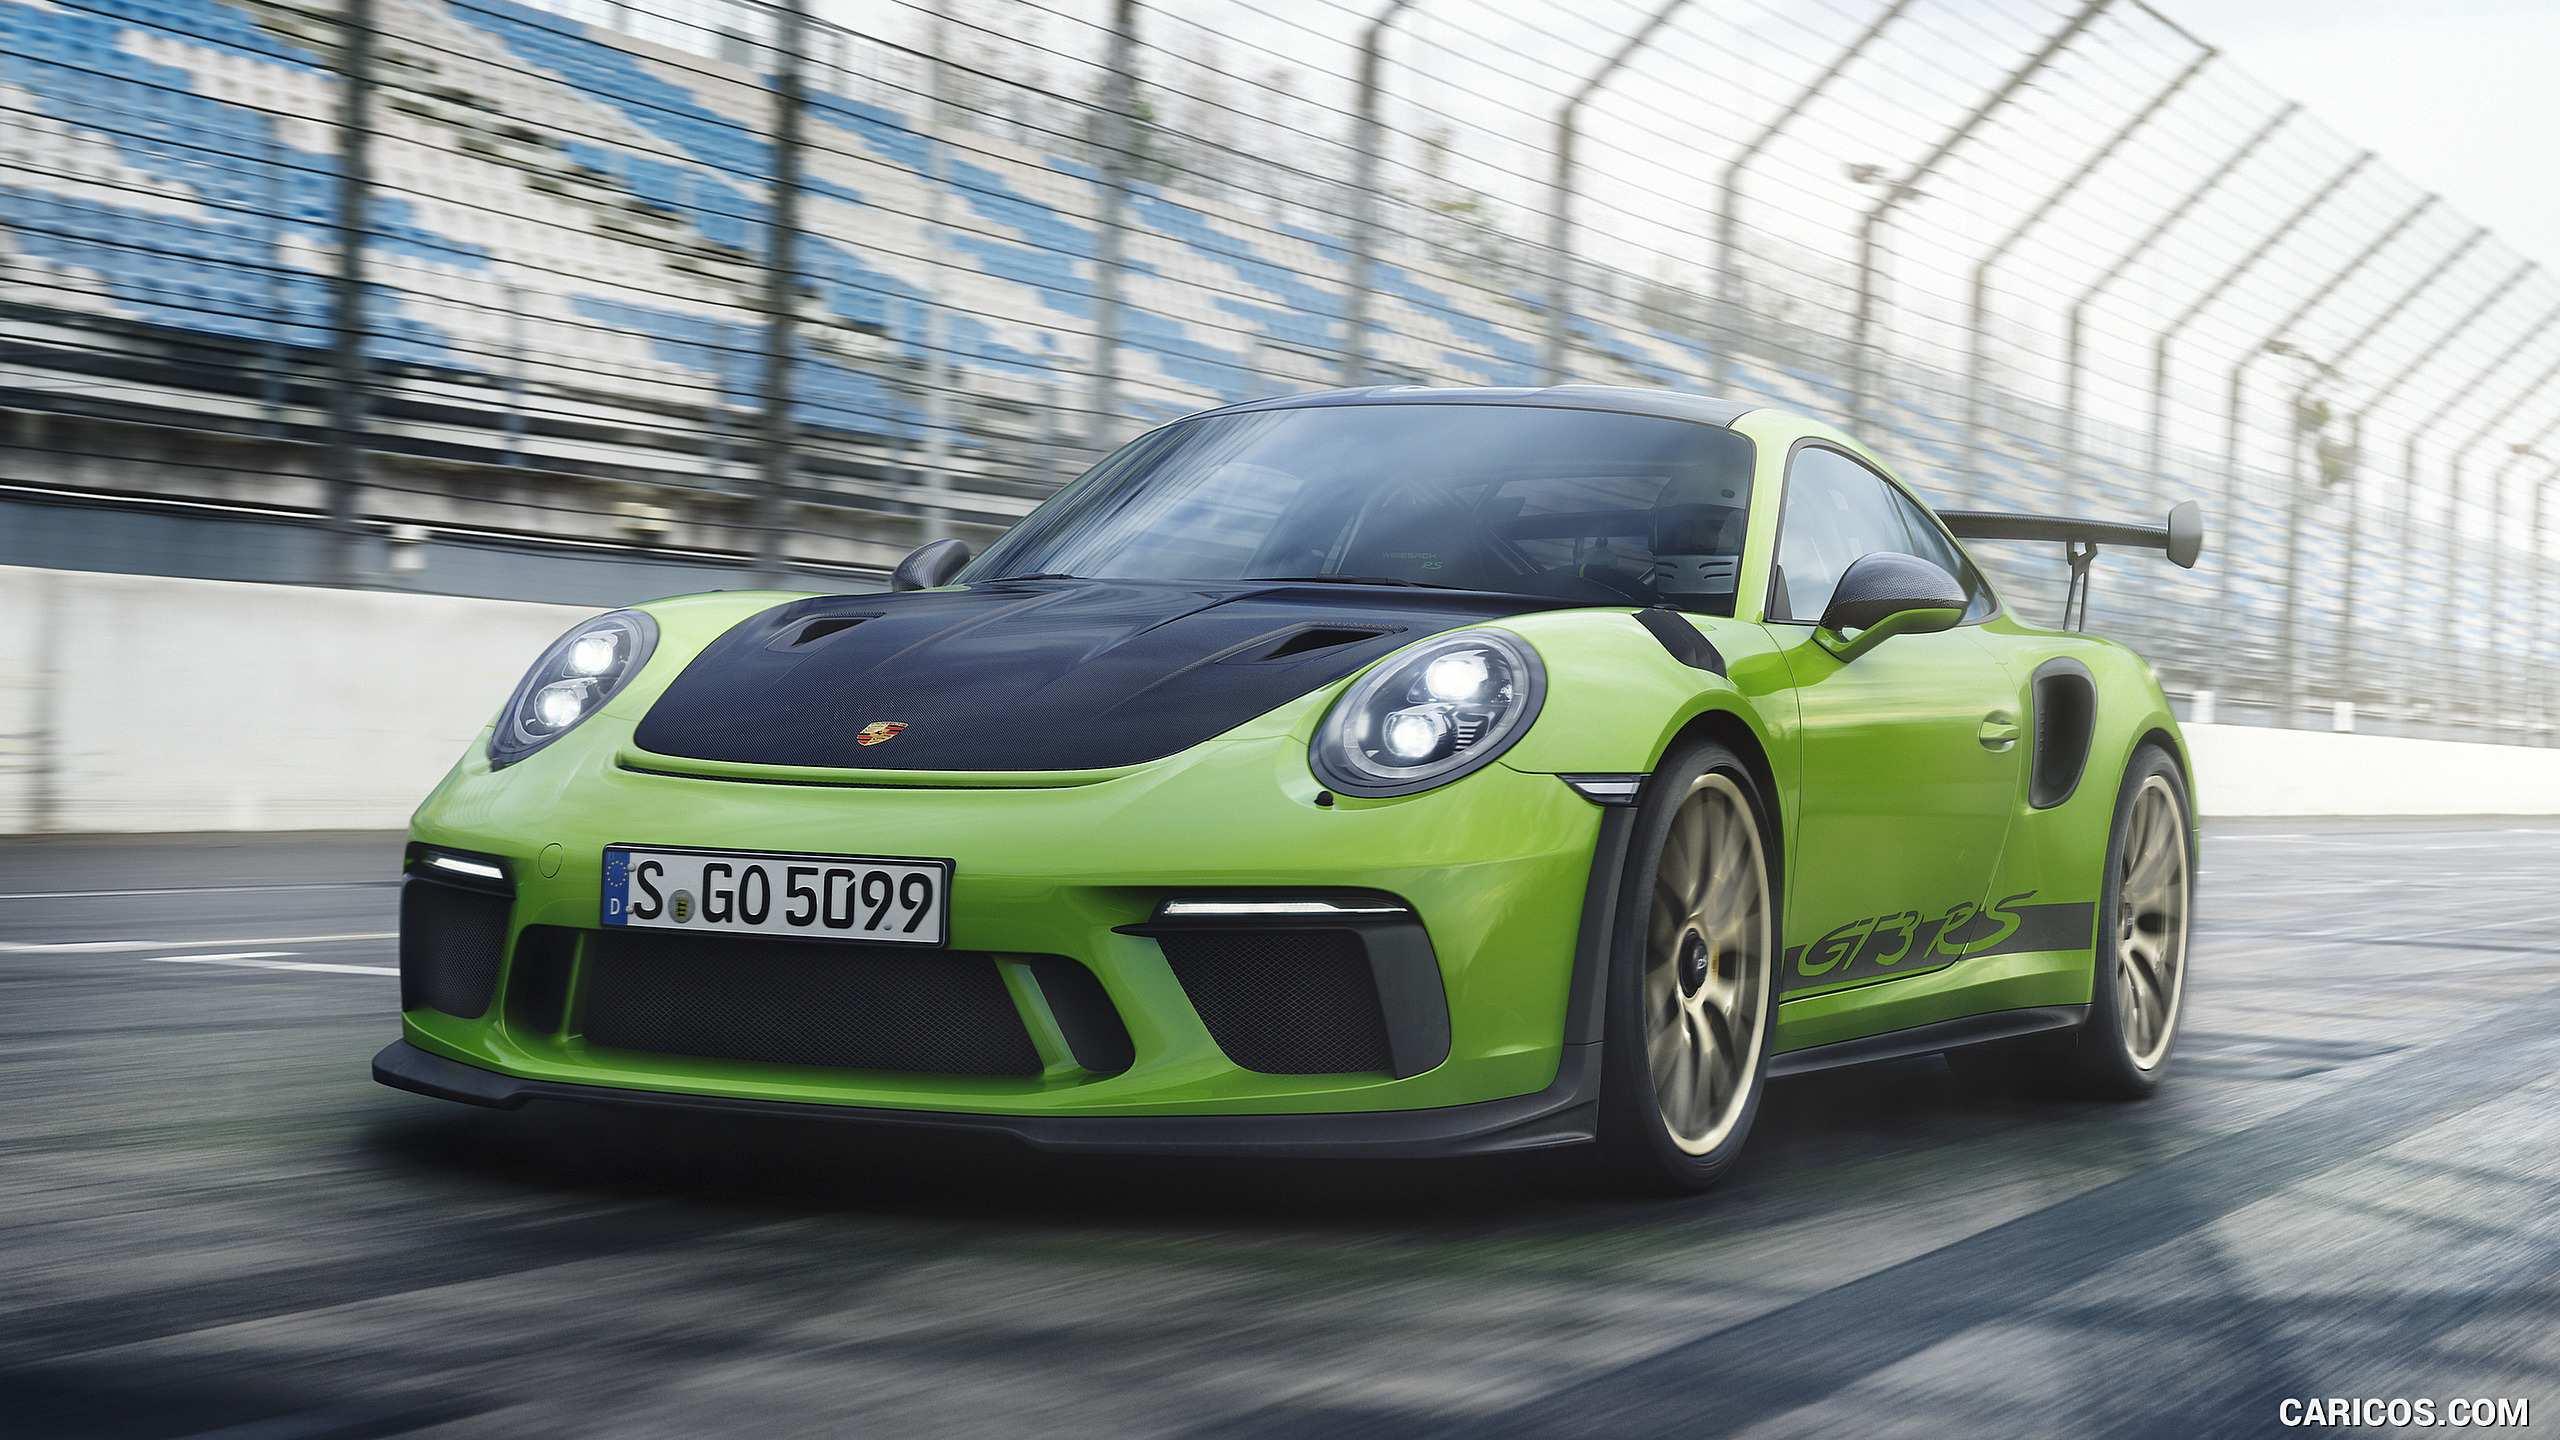 86 Great 2019 Porsche Gt3 Rs Overview for 2019 Porsche Gt3 Rs